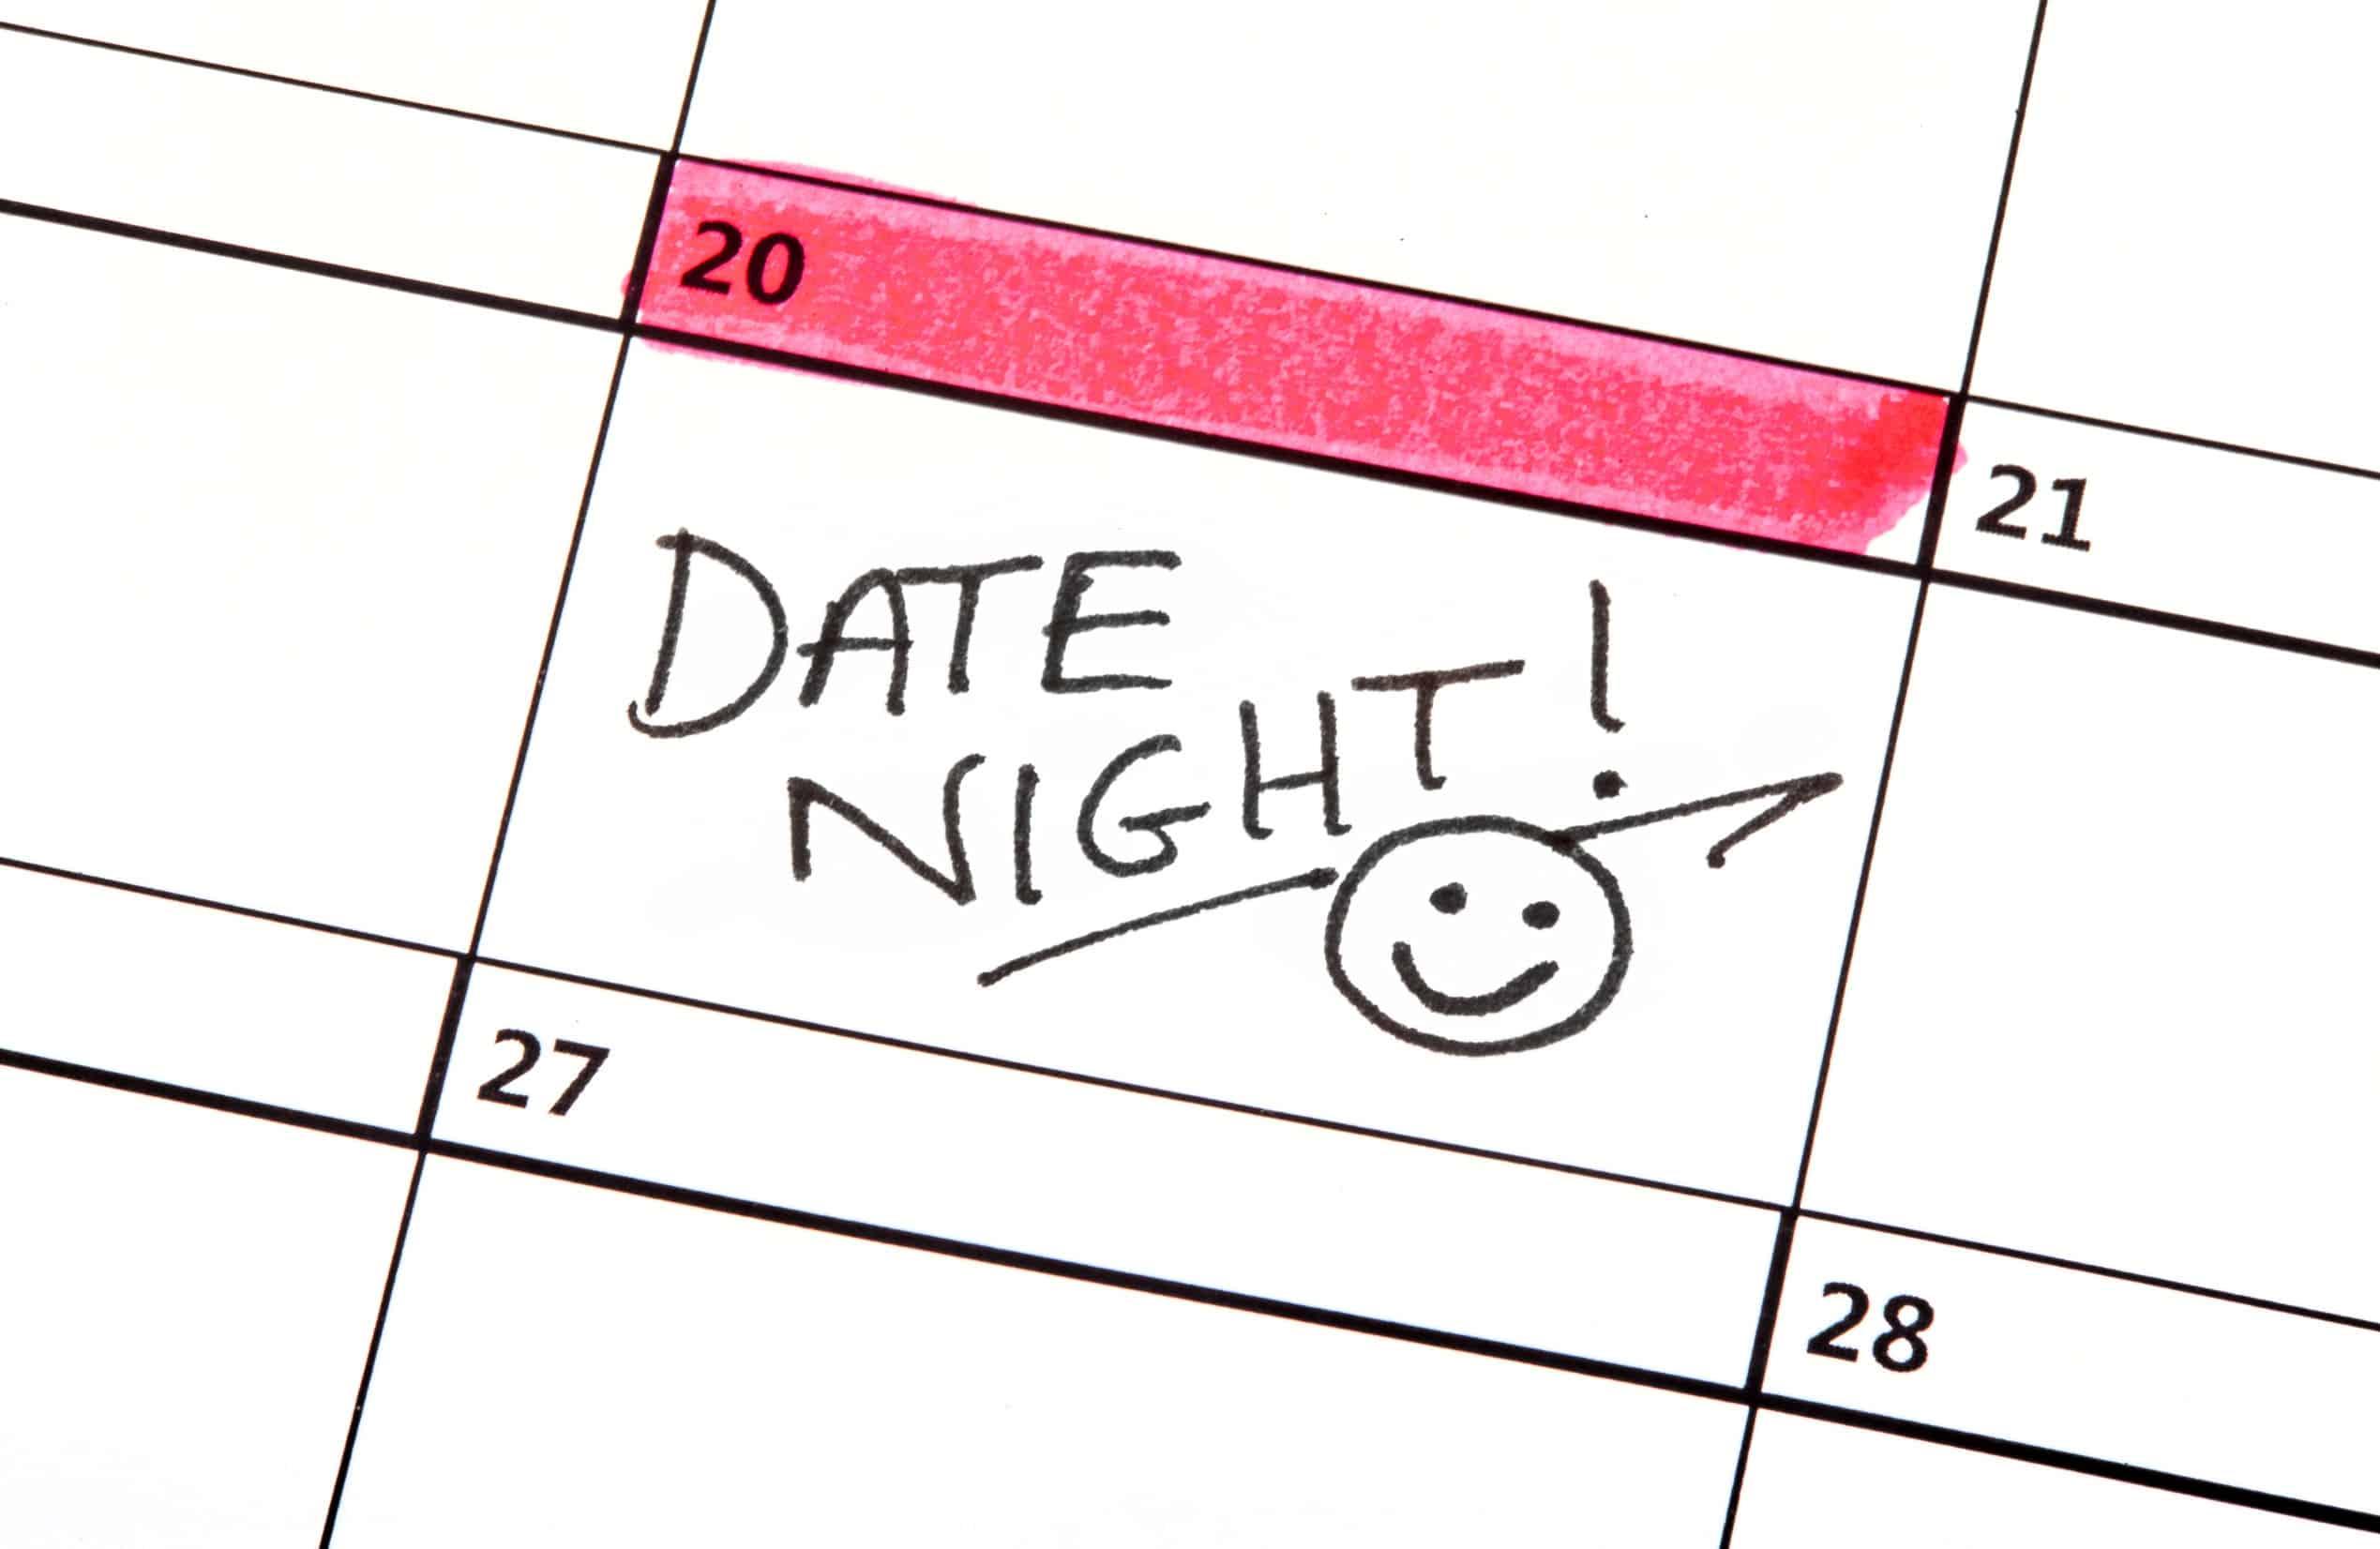 40217683 - a date night highlighted on a calendar.